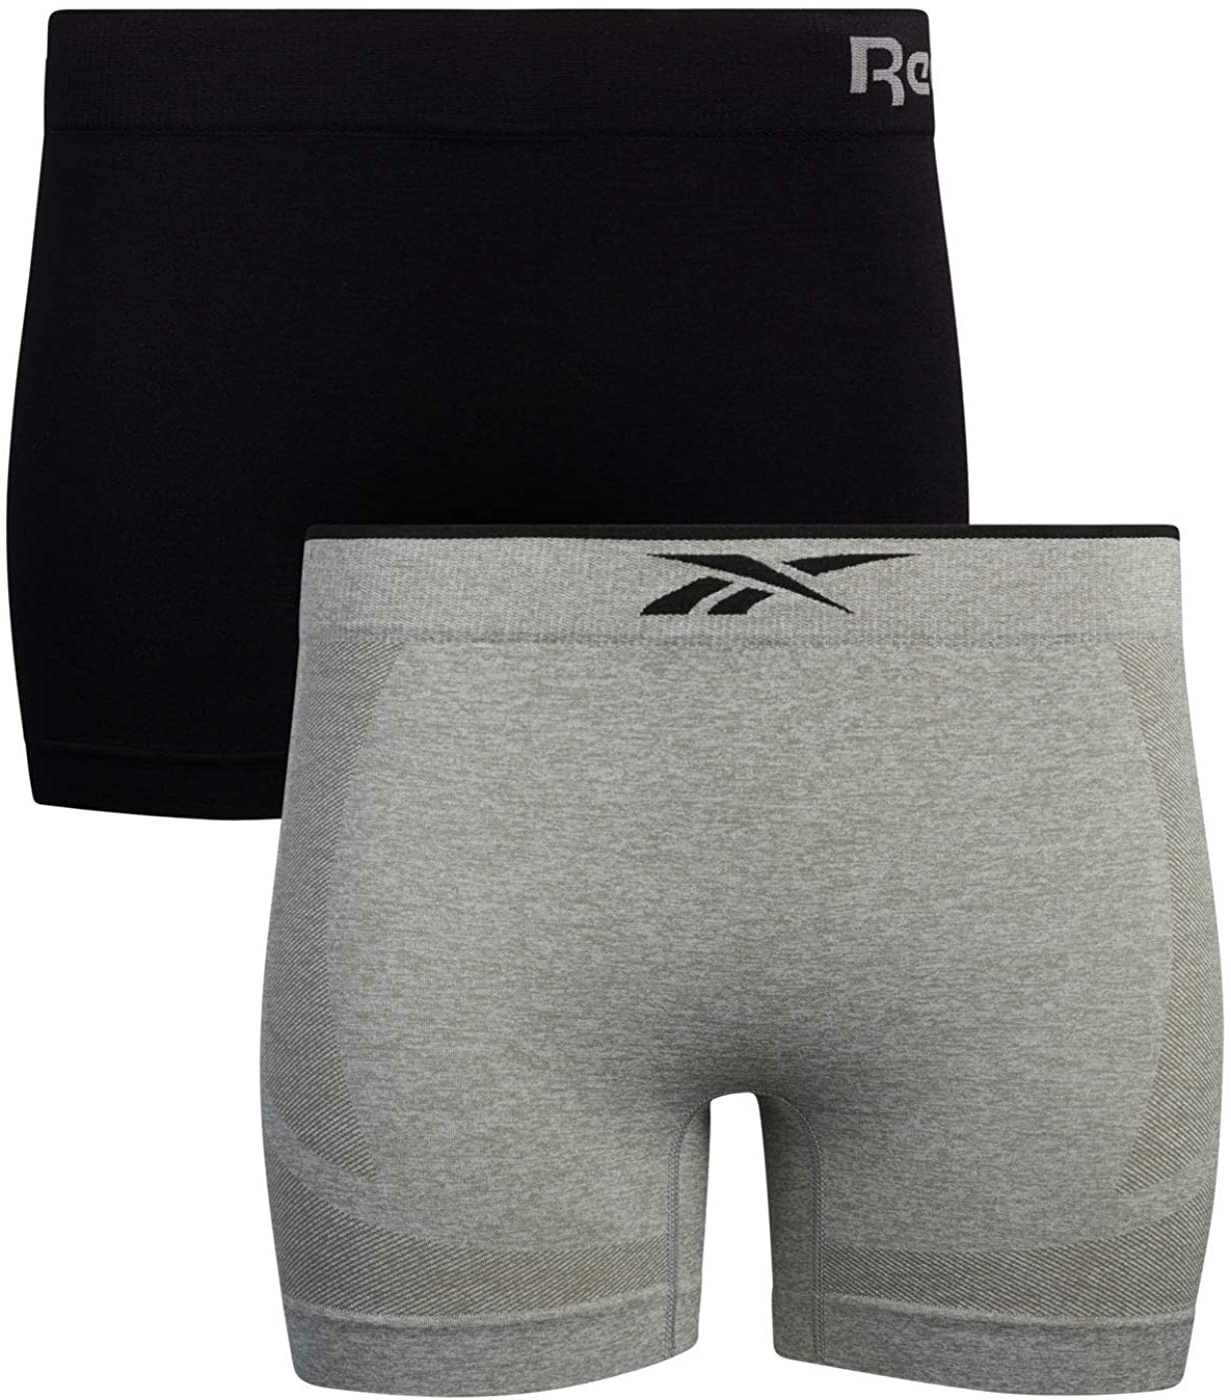 Reebok Women's Underwear – Mid Length Seamless Boyshorts (2 Pack) at  Women's Clothing store